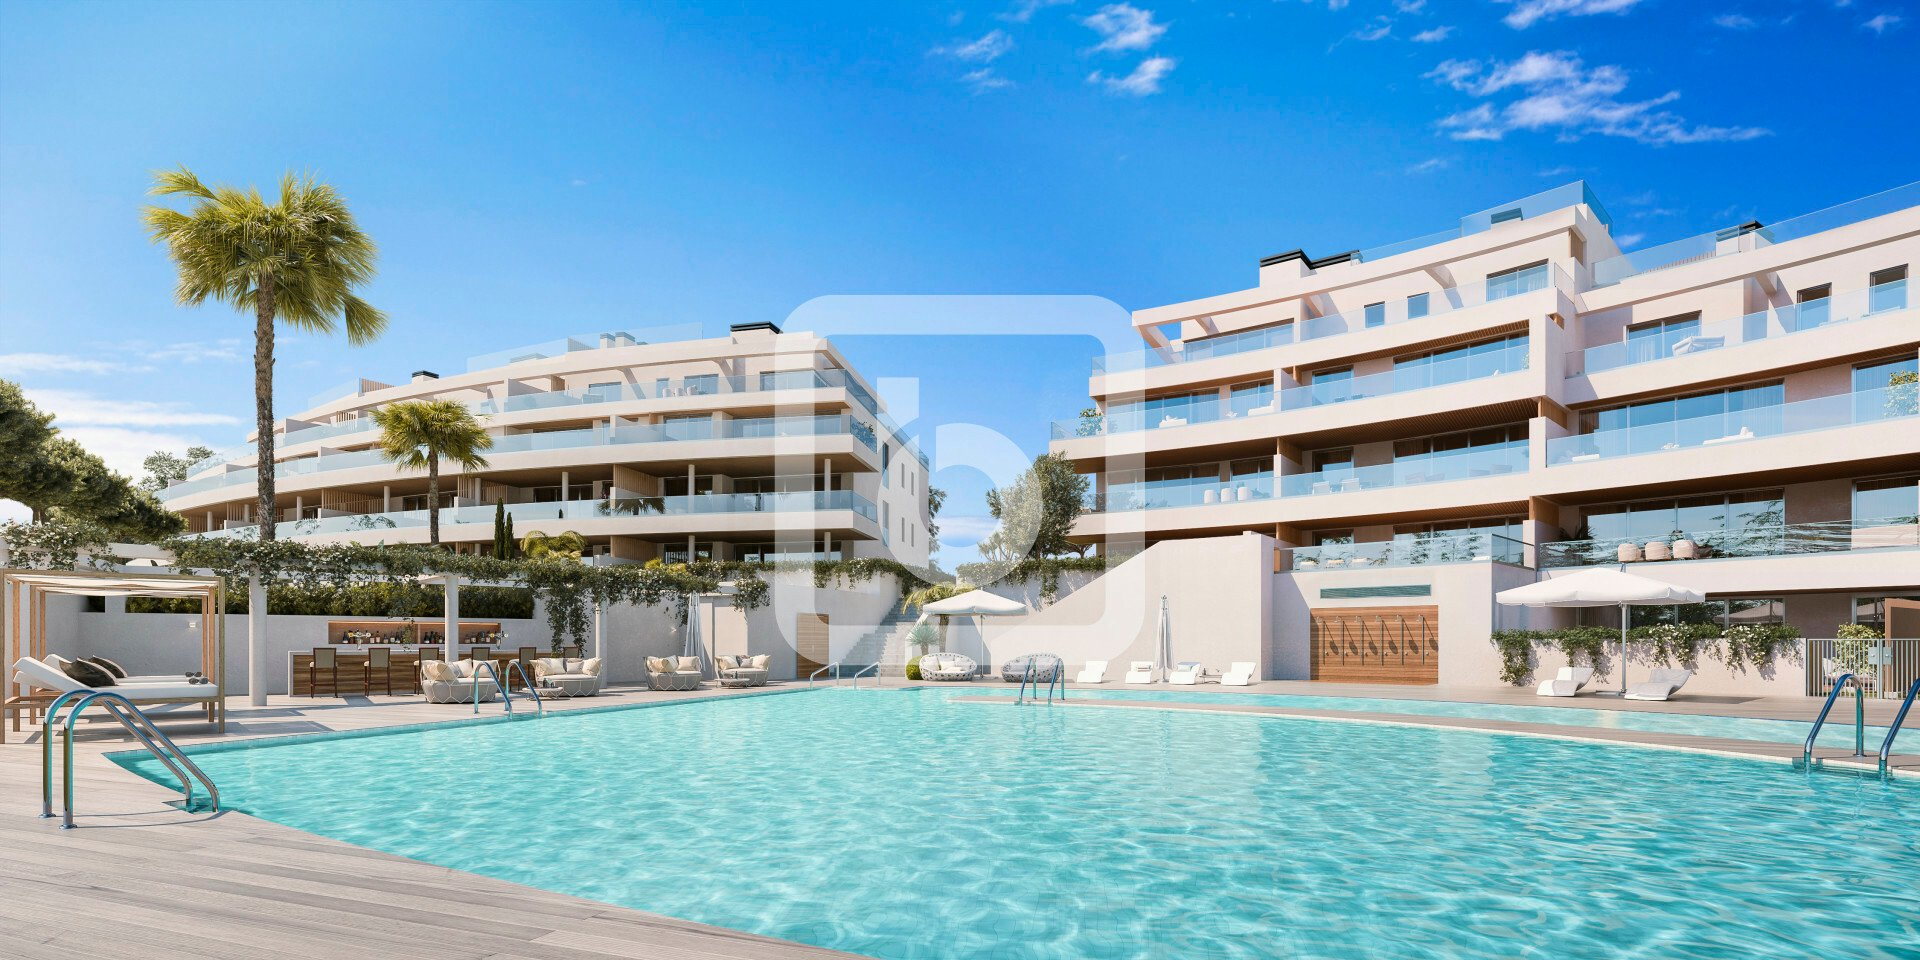 Apartment in Mijas, Andalusia, Spain 1 - 11563558